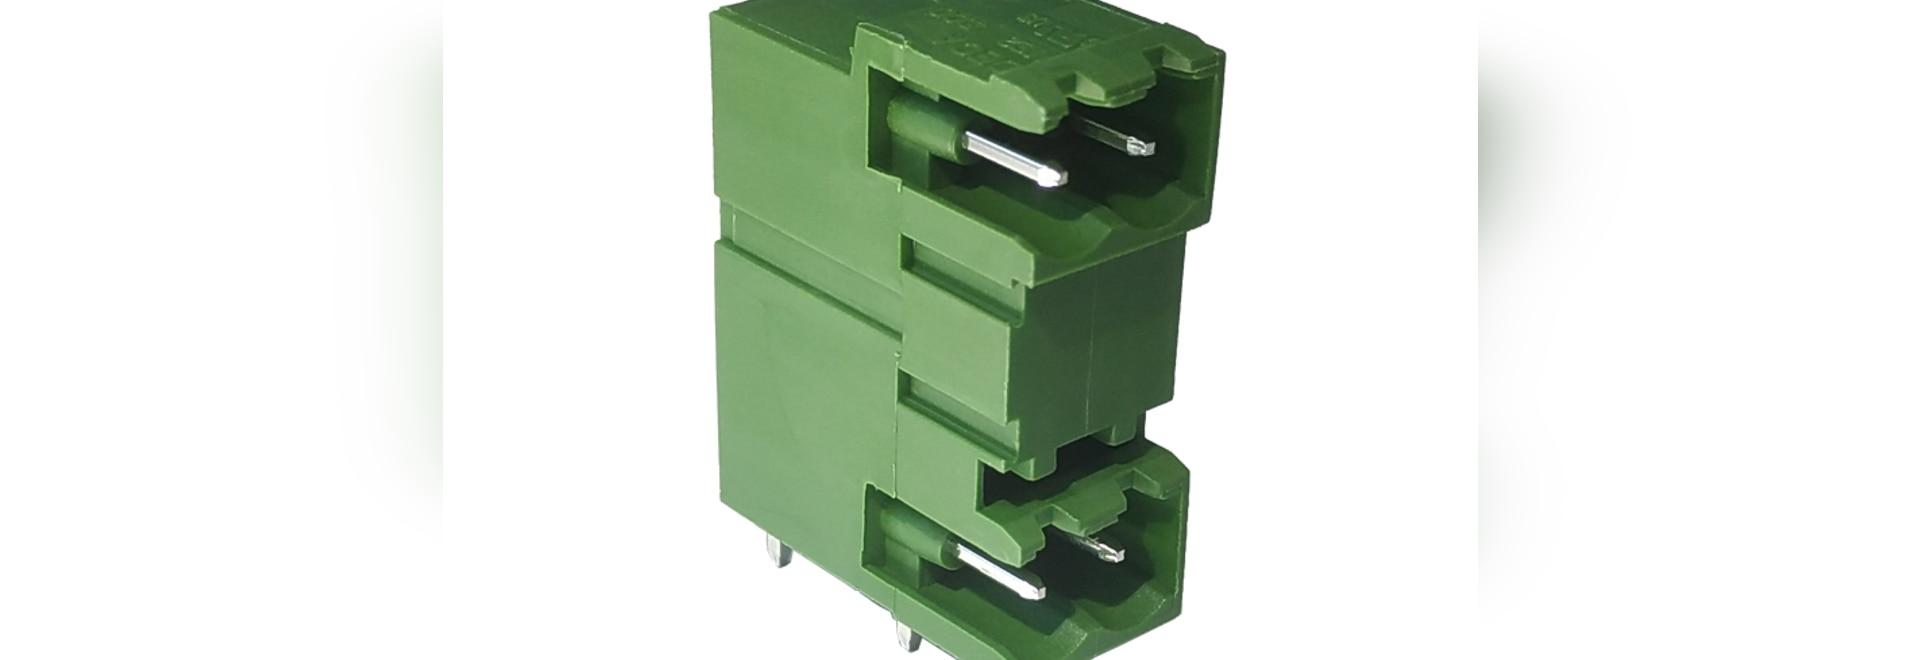 Conector macho de DECA, nivel doble Jefe-modular